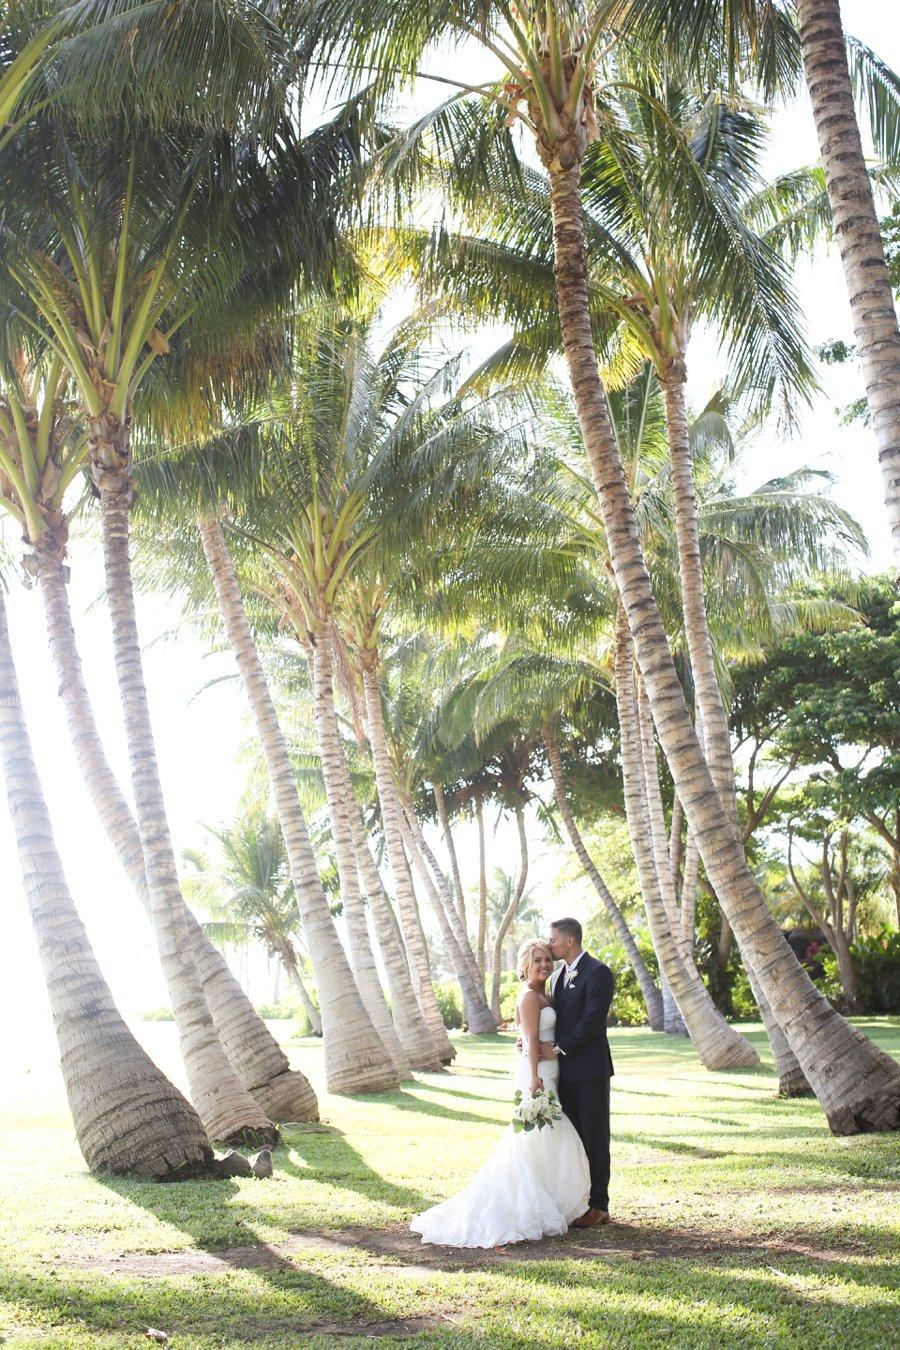 A Rustic Blush & White Intimate Maui Destination Wedding via TheELD.com